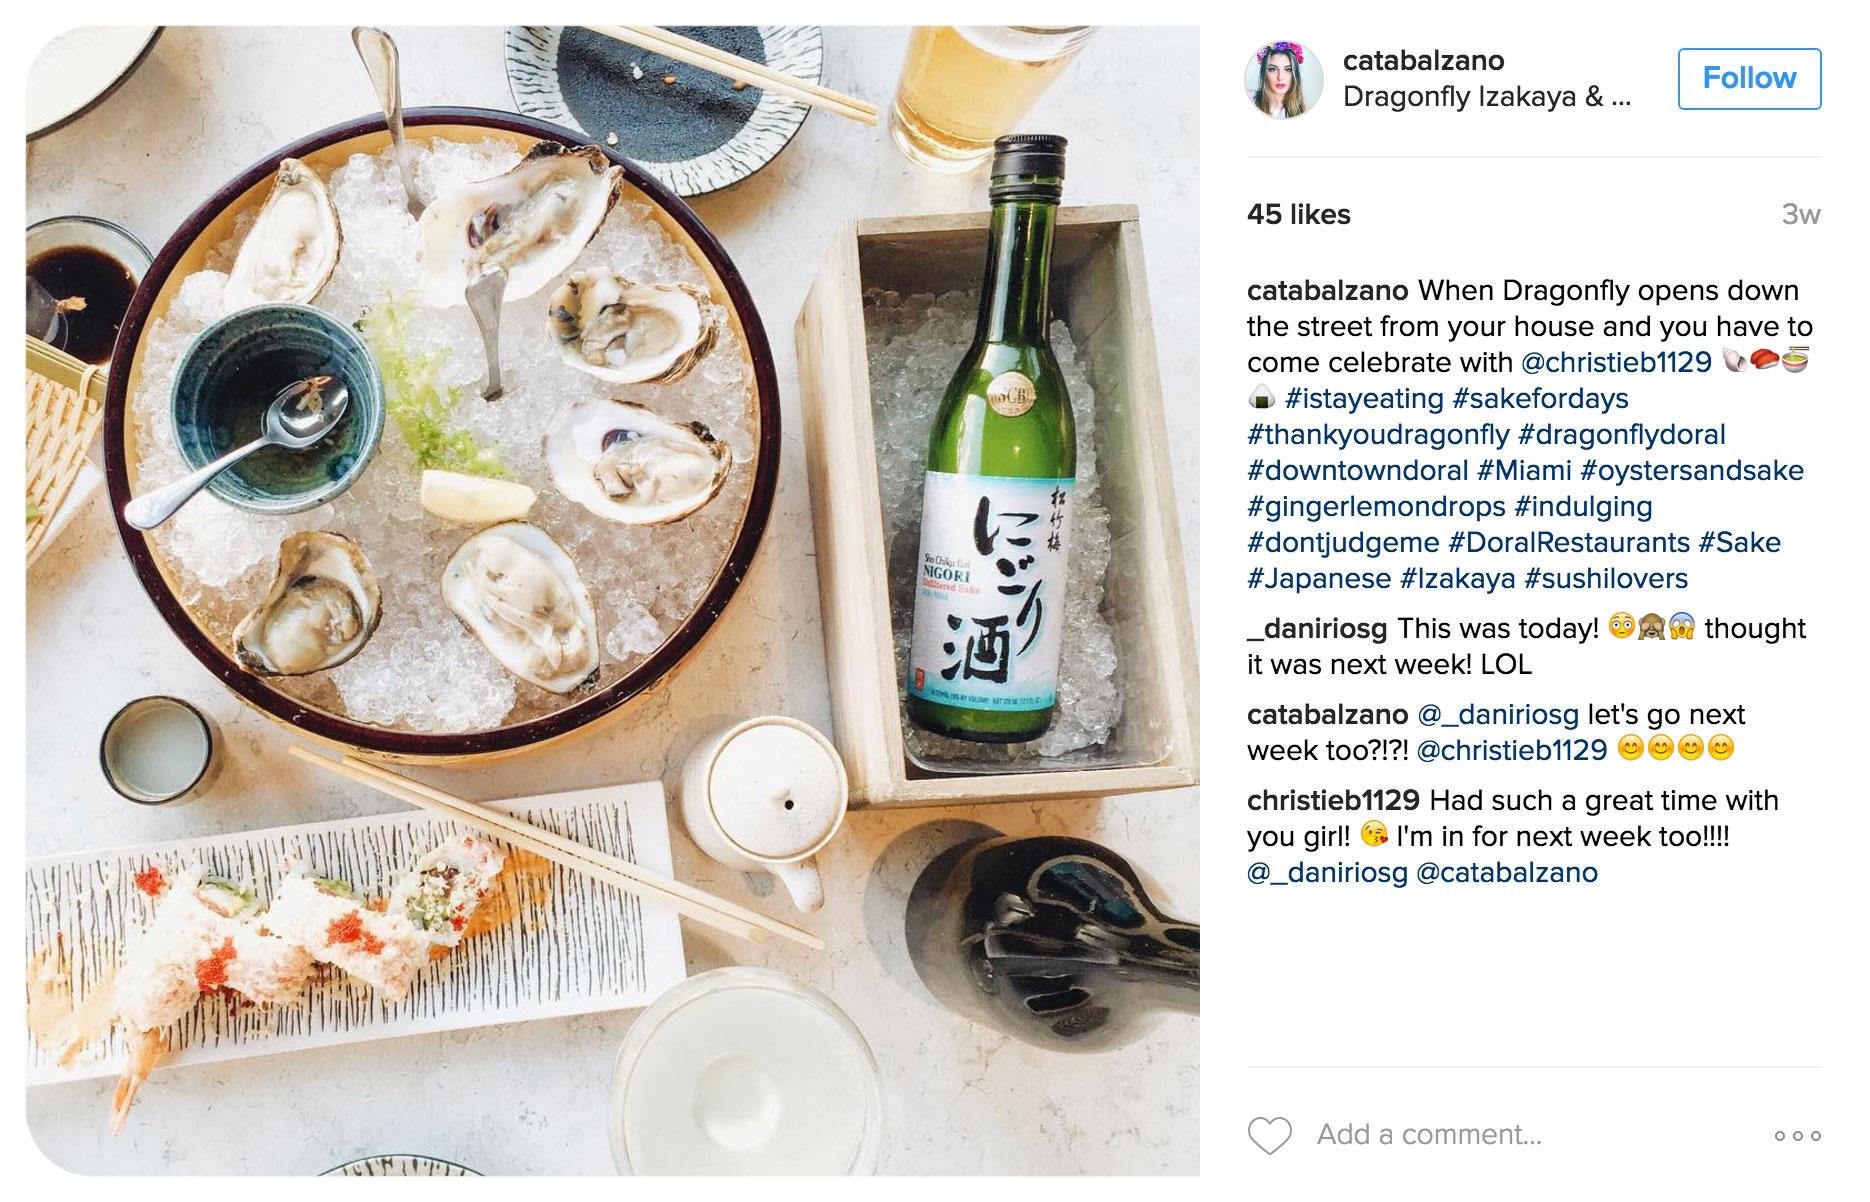 Instagram post from Instagram user Catabalzano.